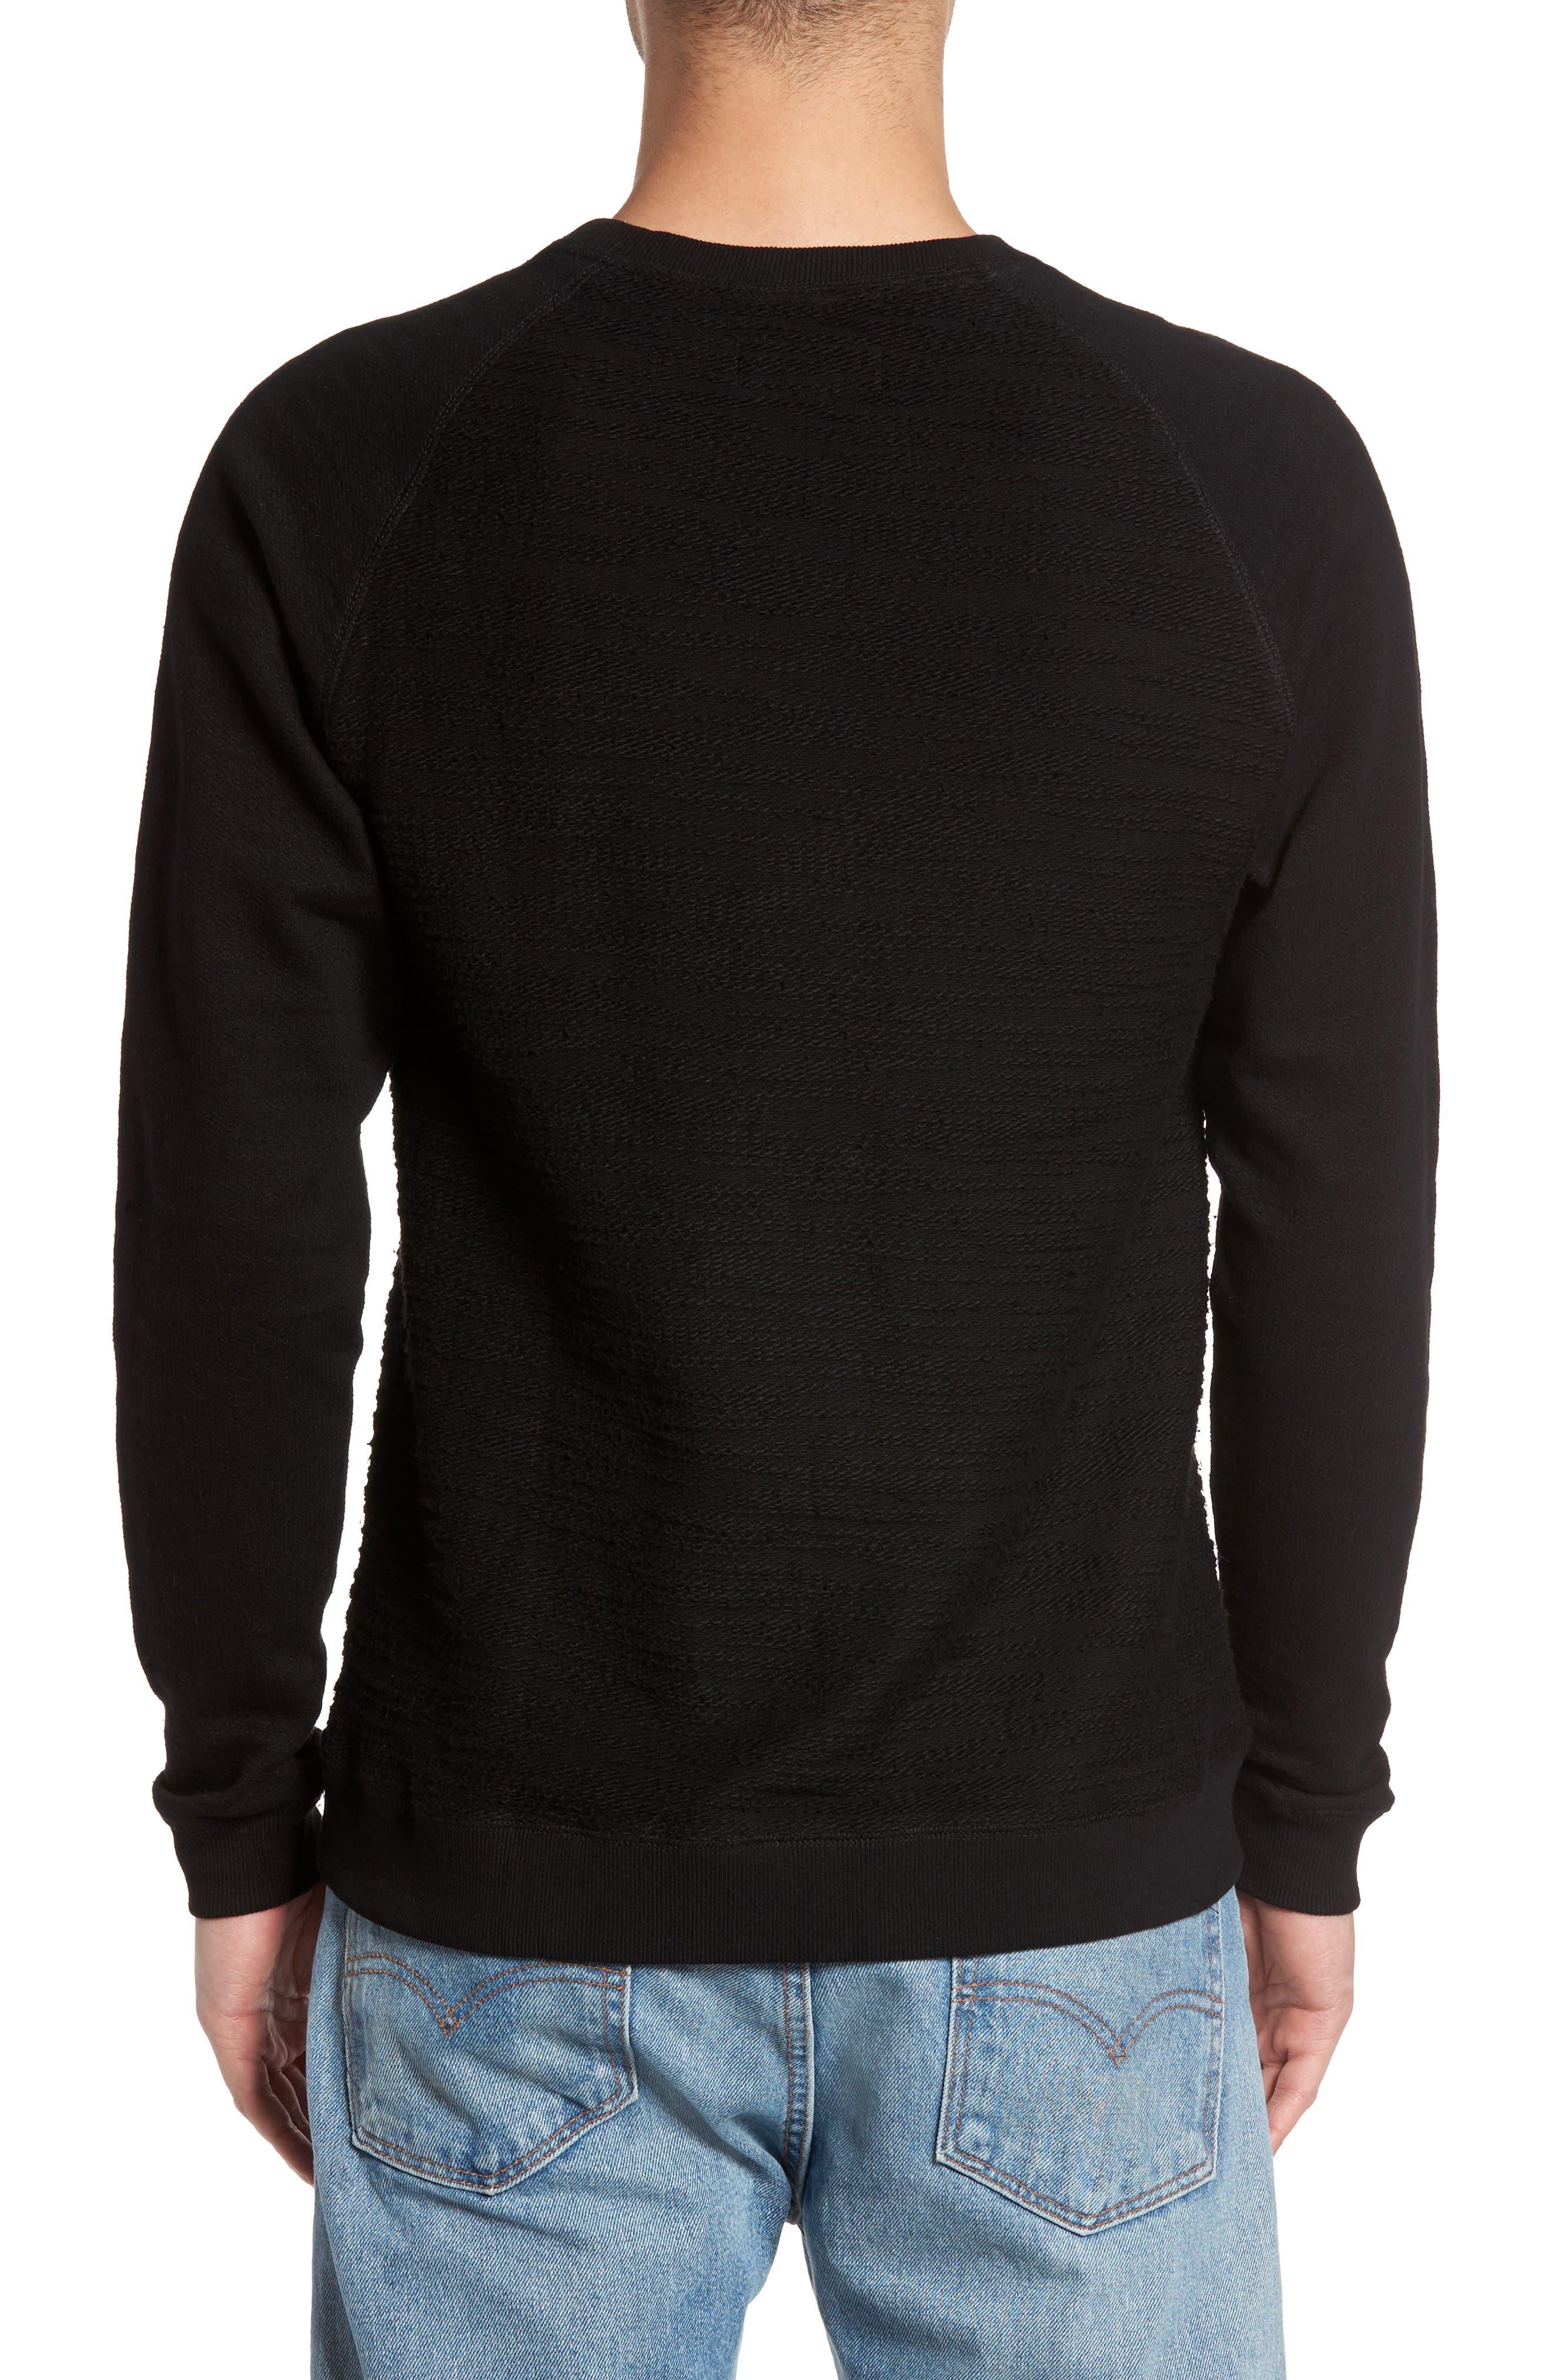 Frey Slubbed Pocket Sweatshirt,                             Alternate thumbnail 2, color,                             001